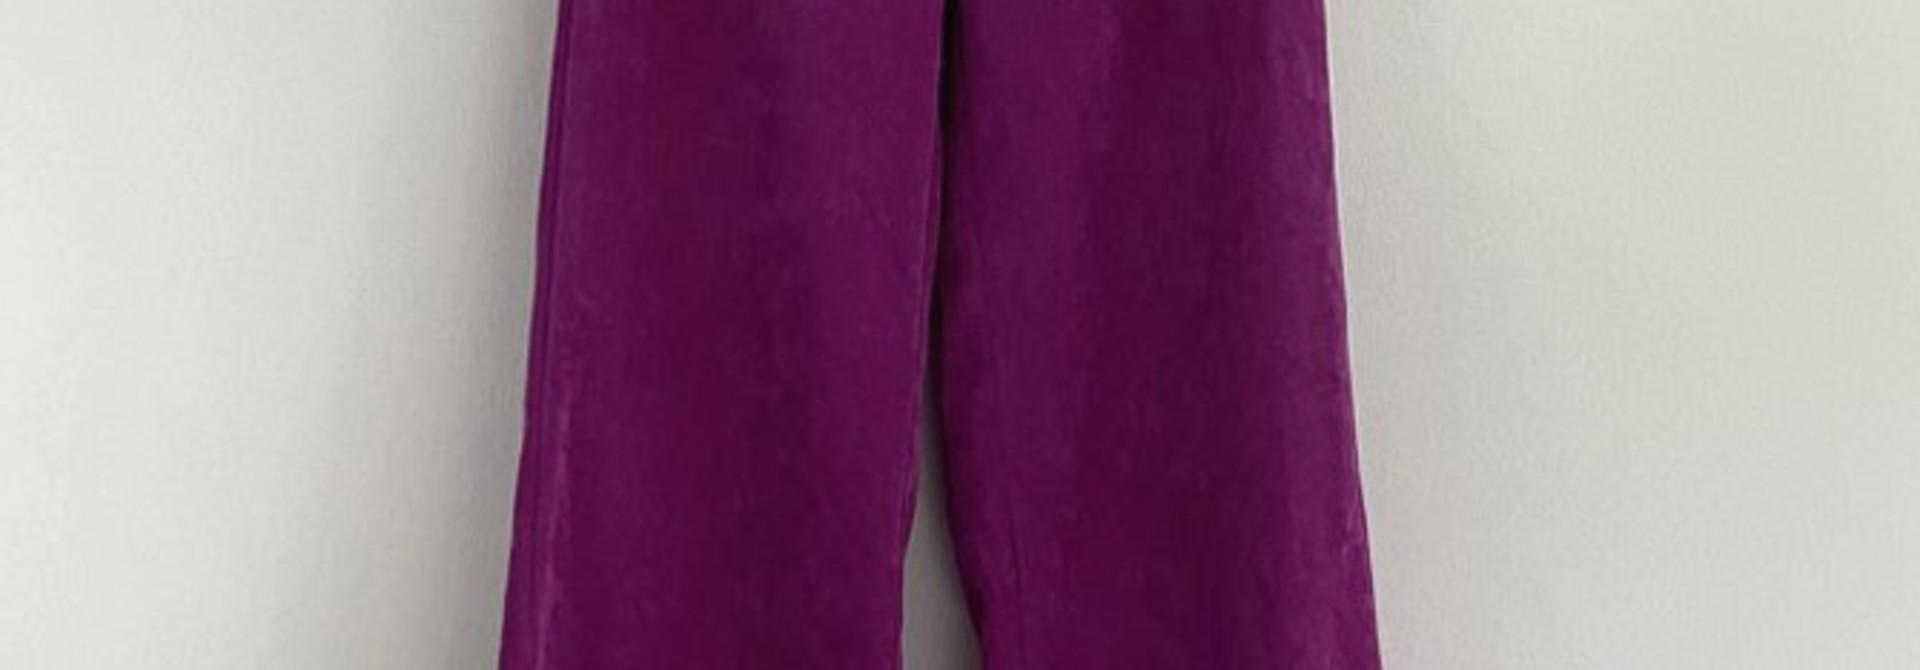 Charro corduroy wide pant Fushia